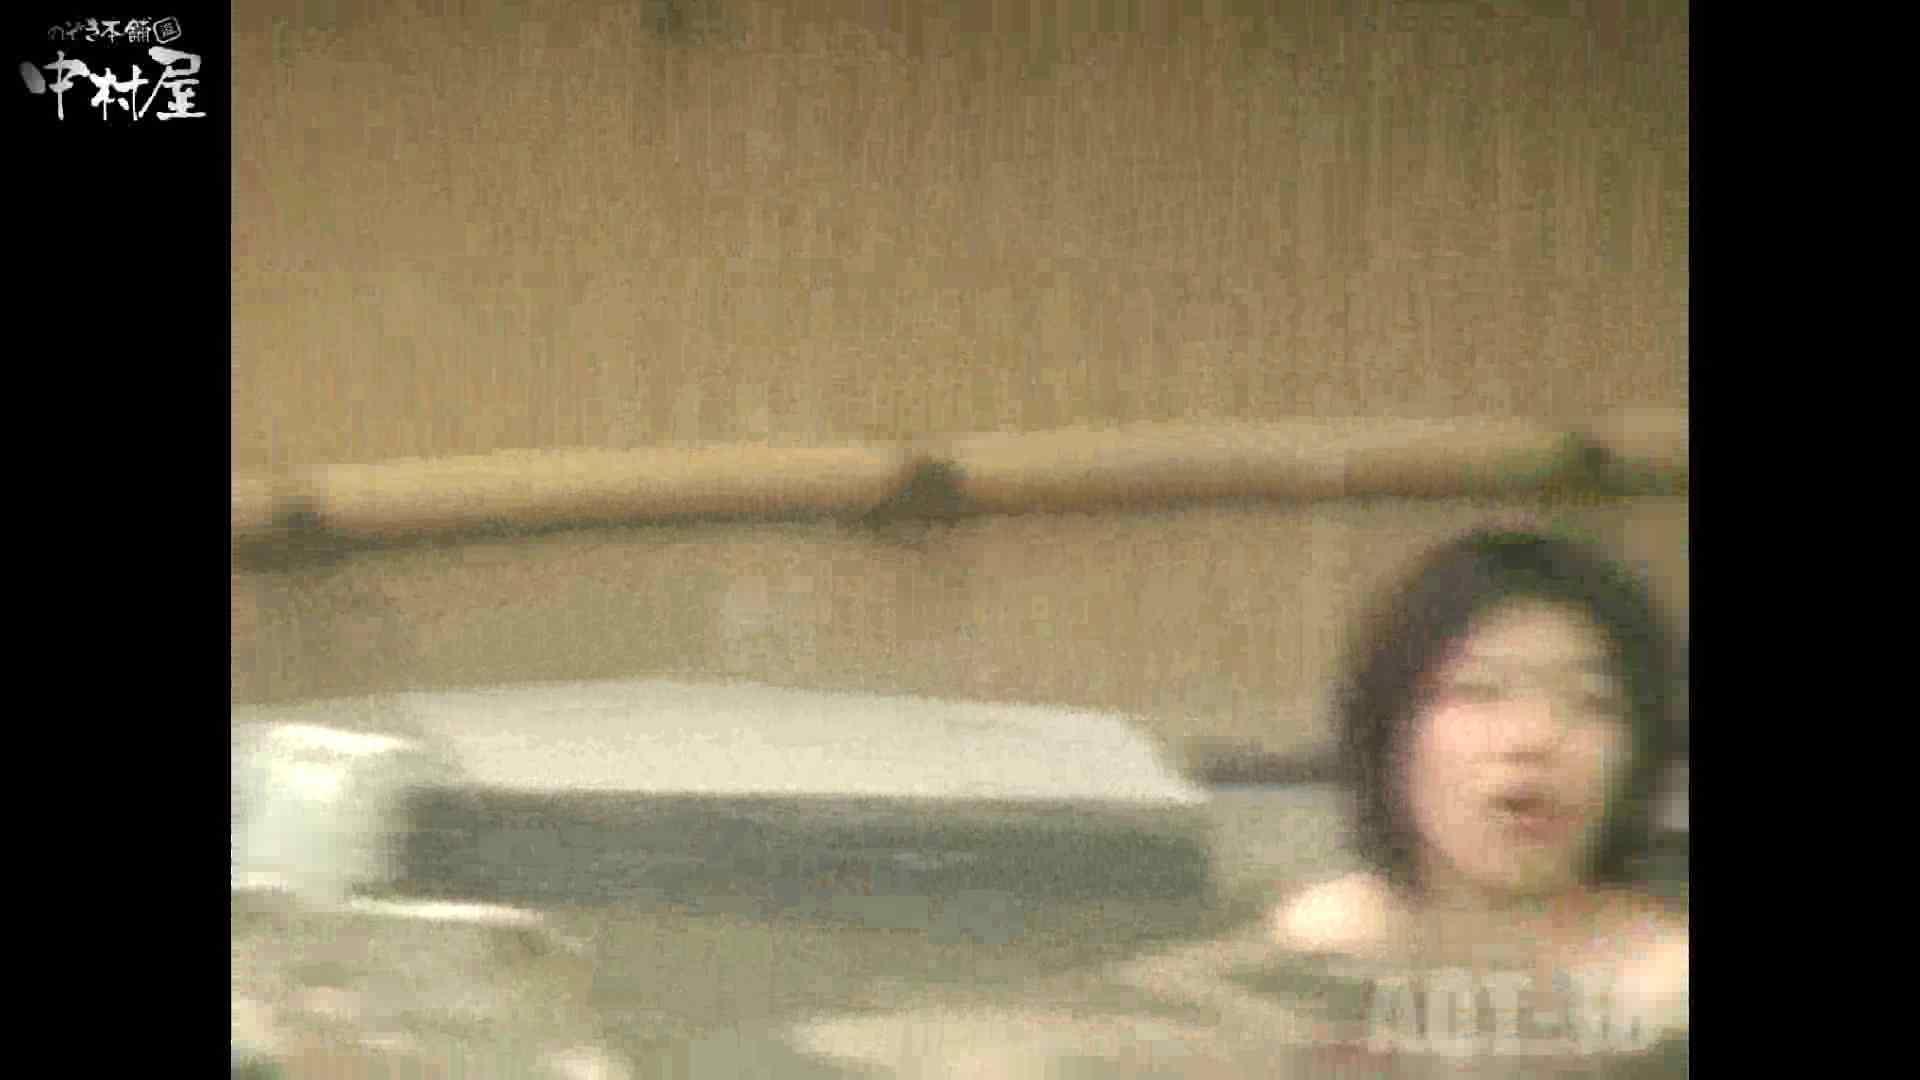 Aquaな露天風呂Vol.882潜入盗撮露天風呂十八判湯 其の七 0   0  48pic 15